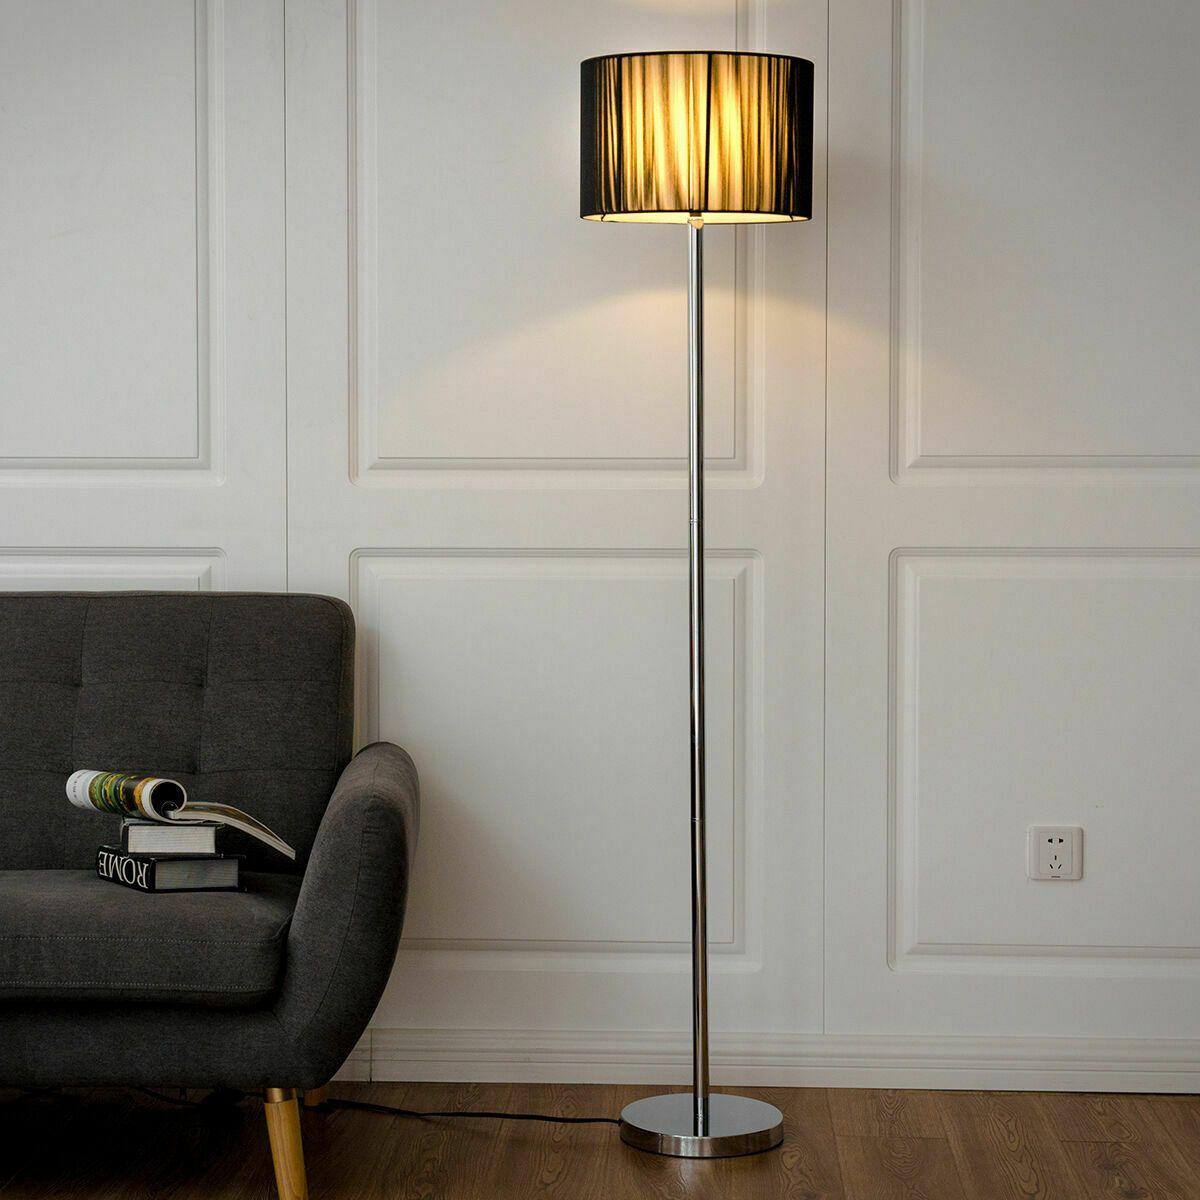 Details About Modern Floor Lamp Sheer Shade Lighting Livingroom Bedroom W Led Bulb Black Modern Floor Lamps Stainless Floor Lamp Classic Floor Lamps